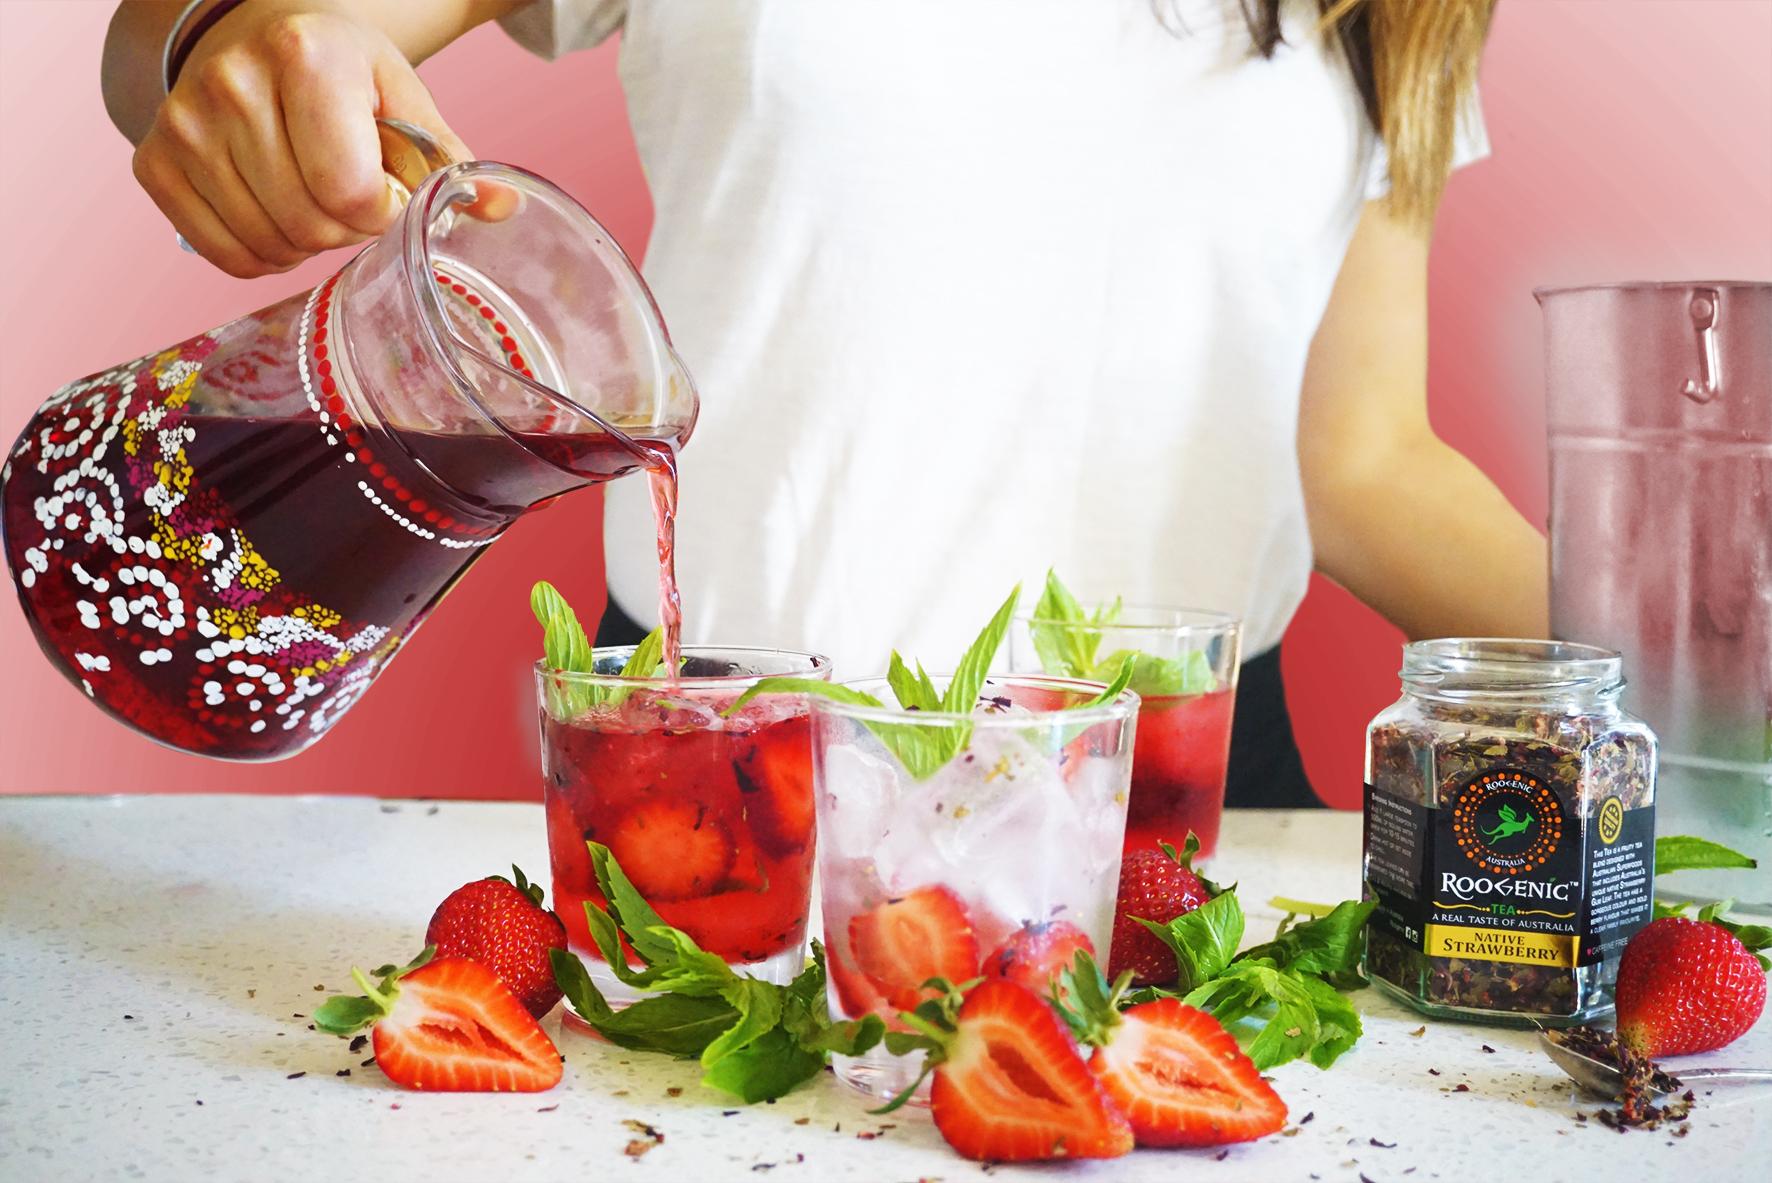 Iced Tea - Native Strawberry